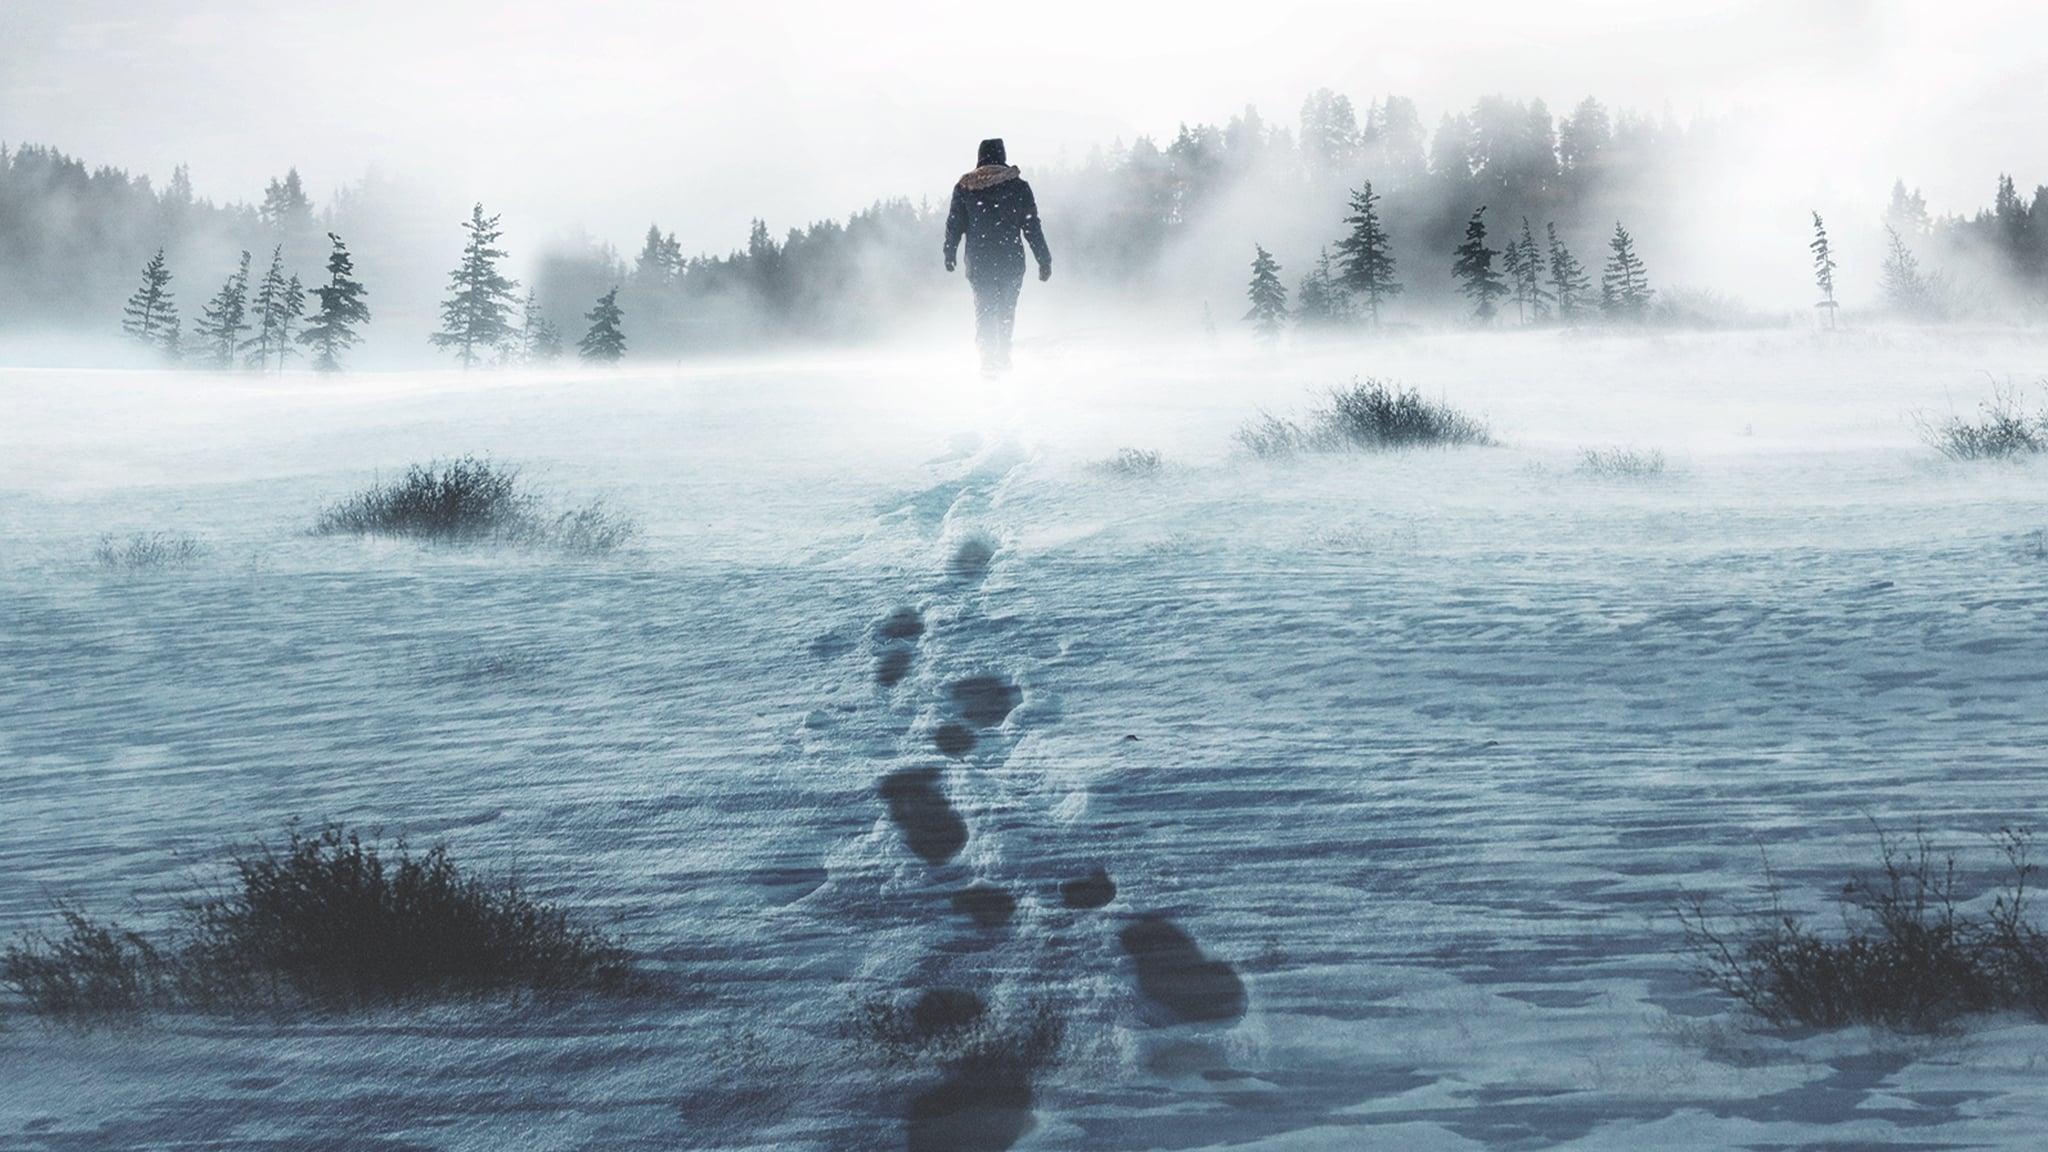 Alone Season 7 Episode 11